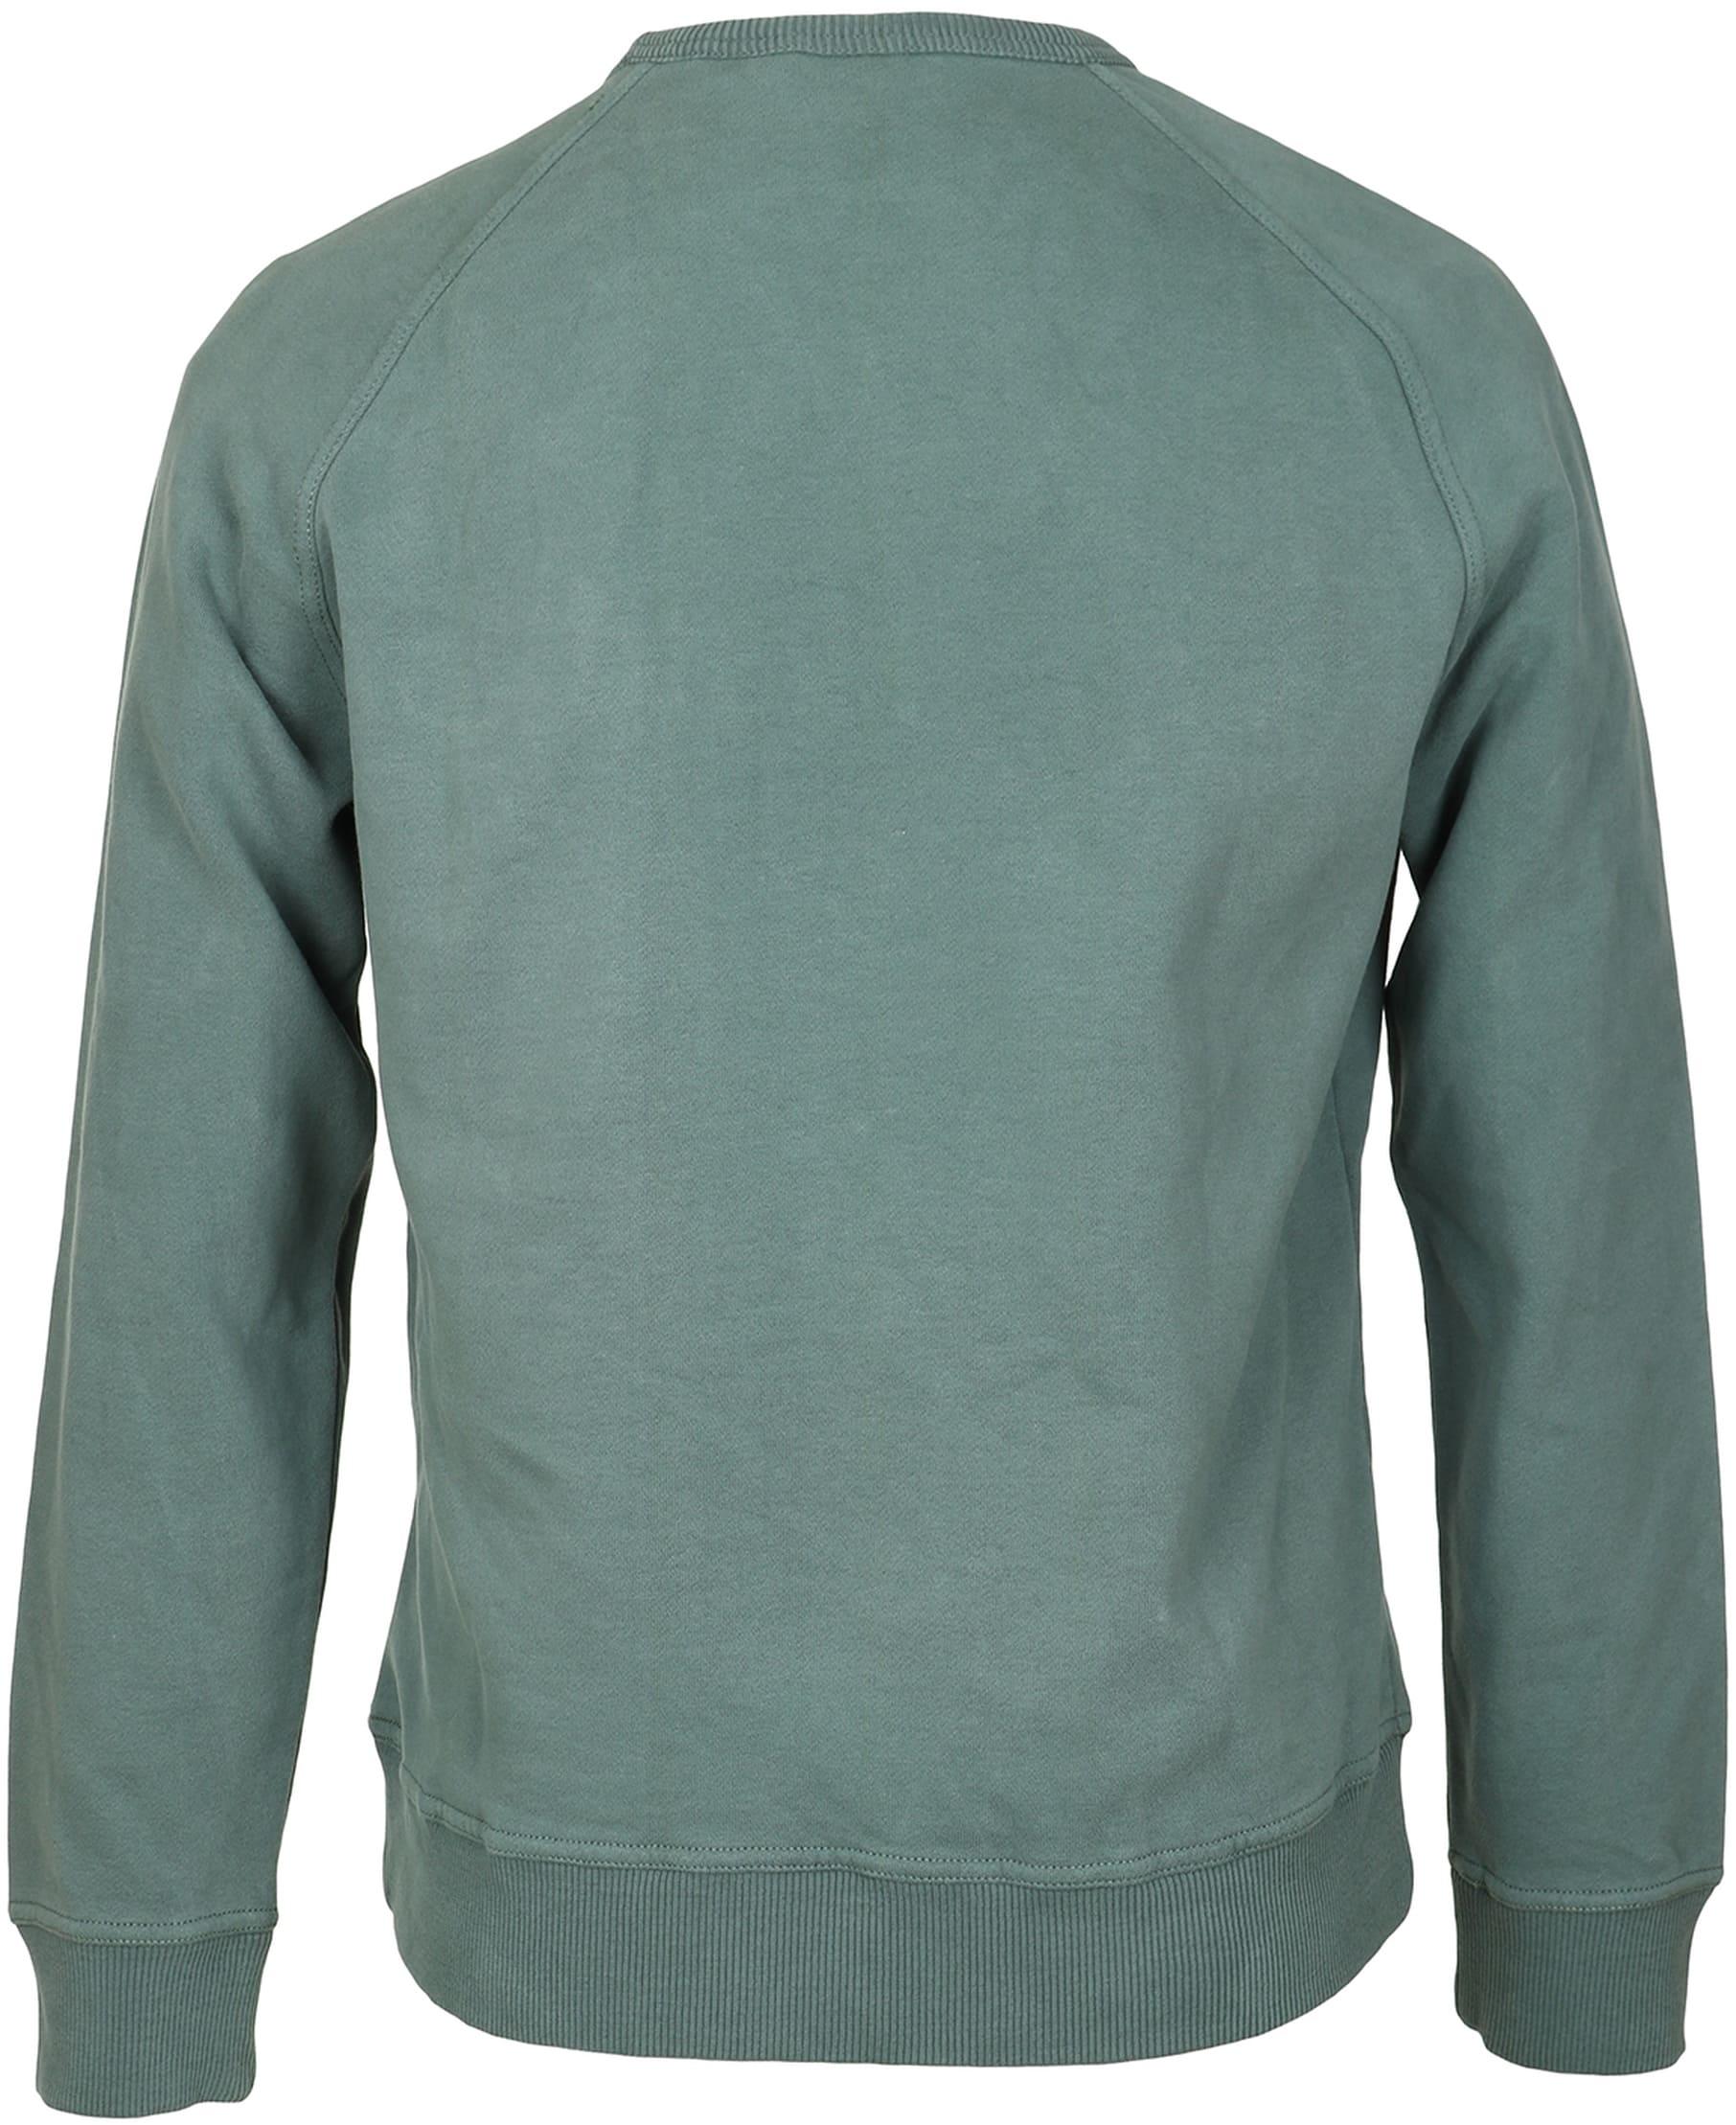 Timberland Sweatshirt Grün Raglan foto 2